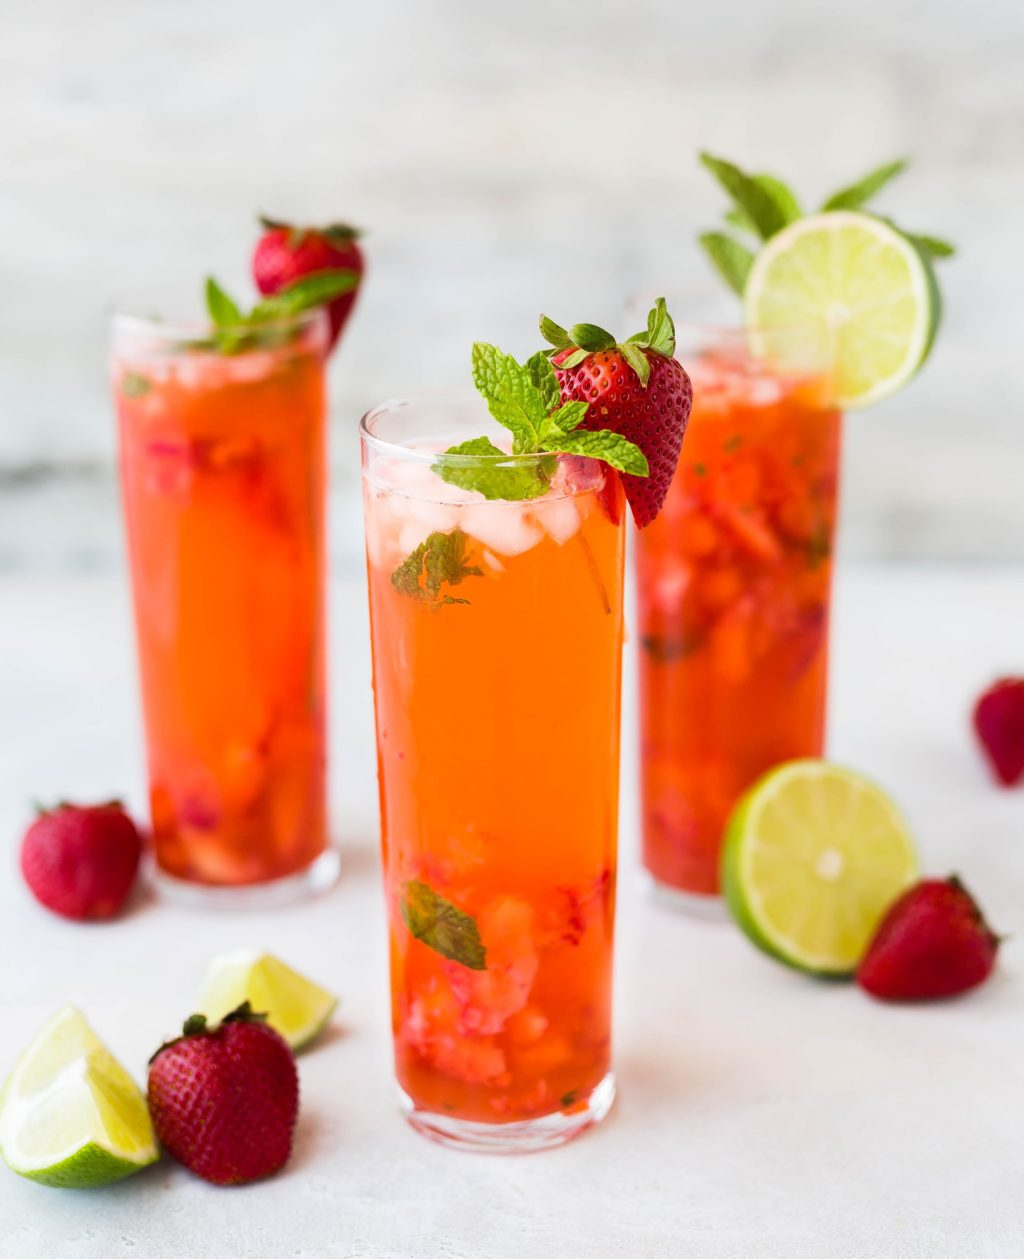 Copycat Starbucks Strawberry Lemonade (Secret Menu Recipe)